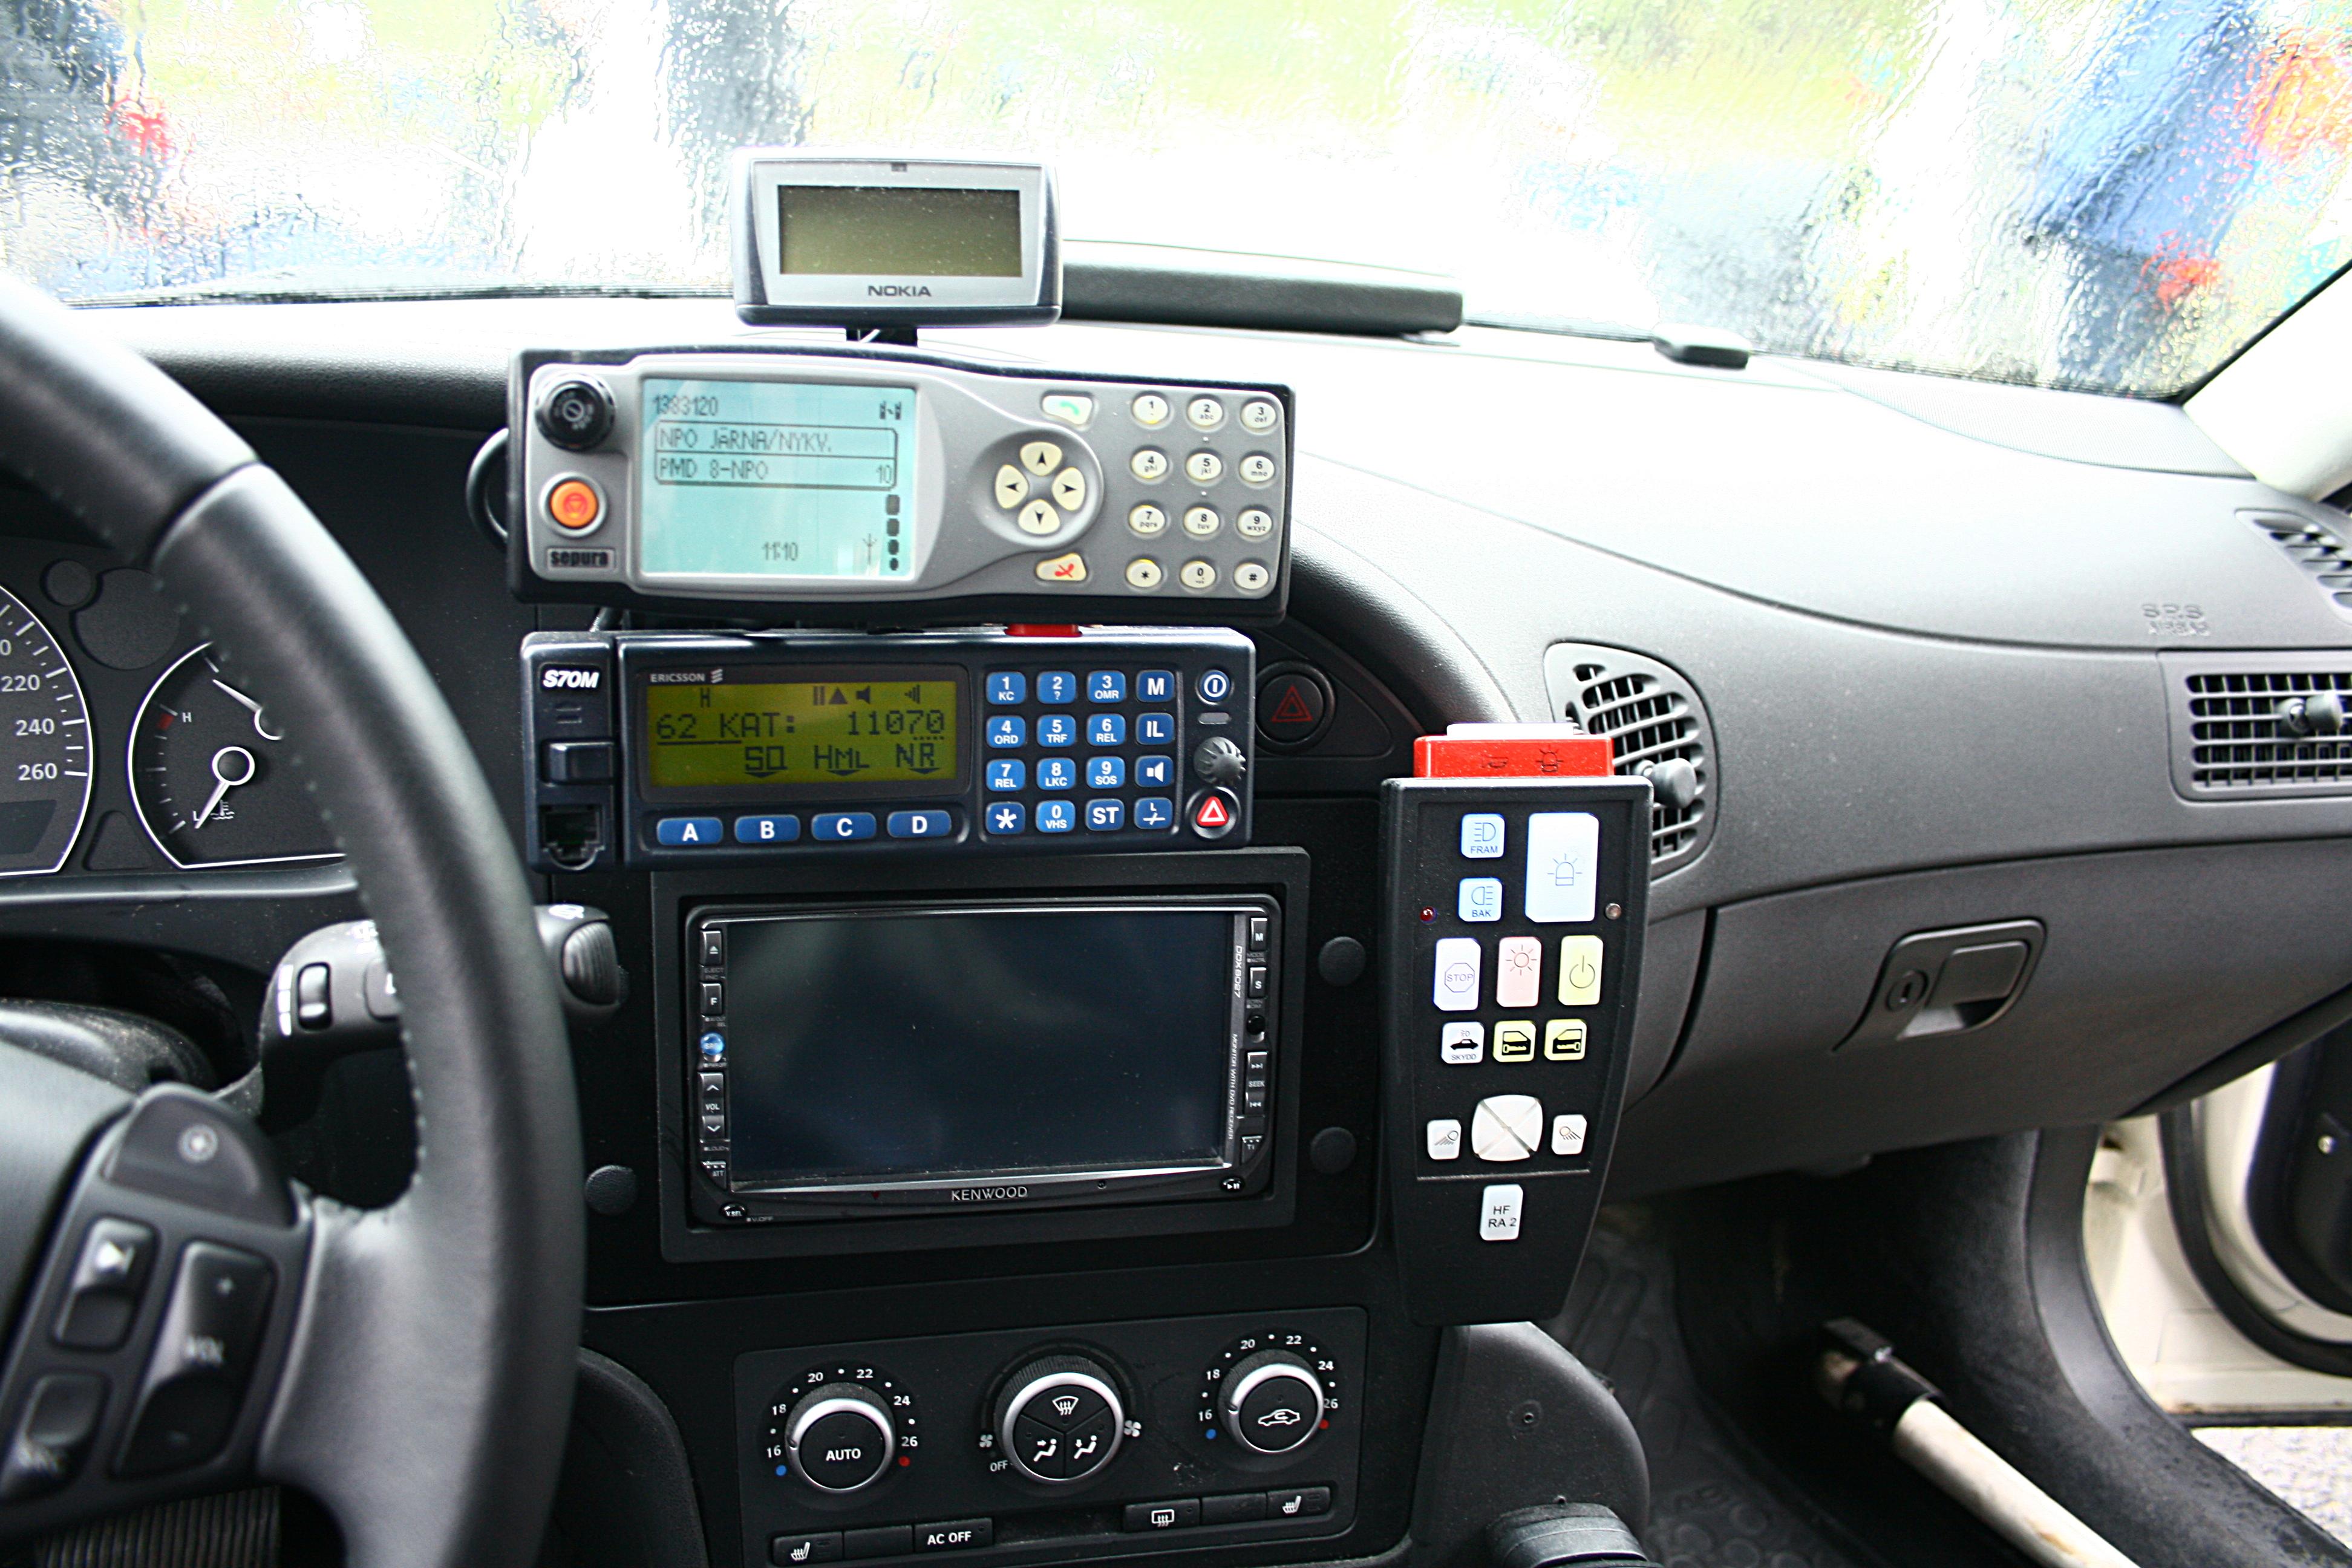 Polisens nya radiosystem togs ur drift